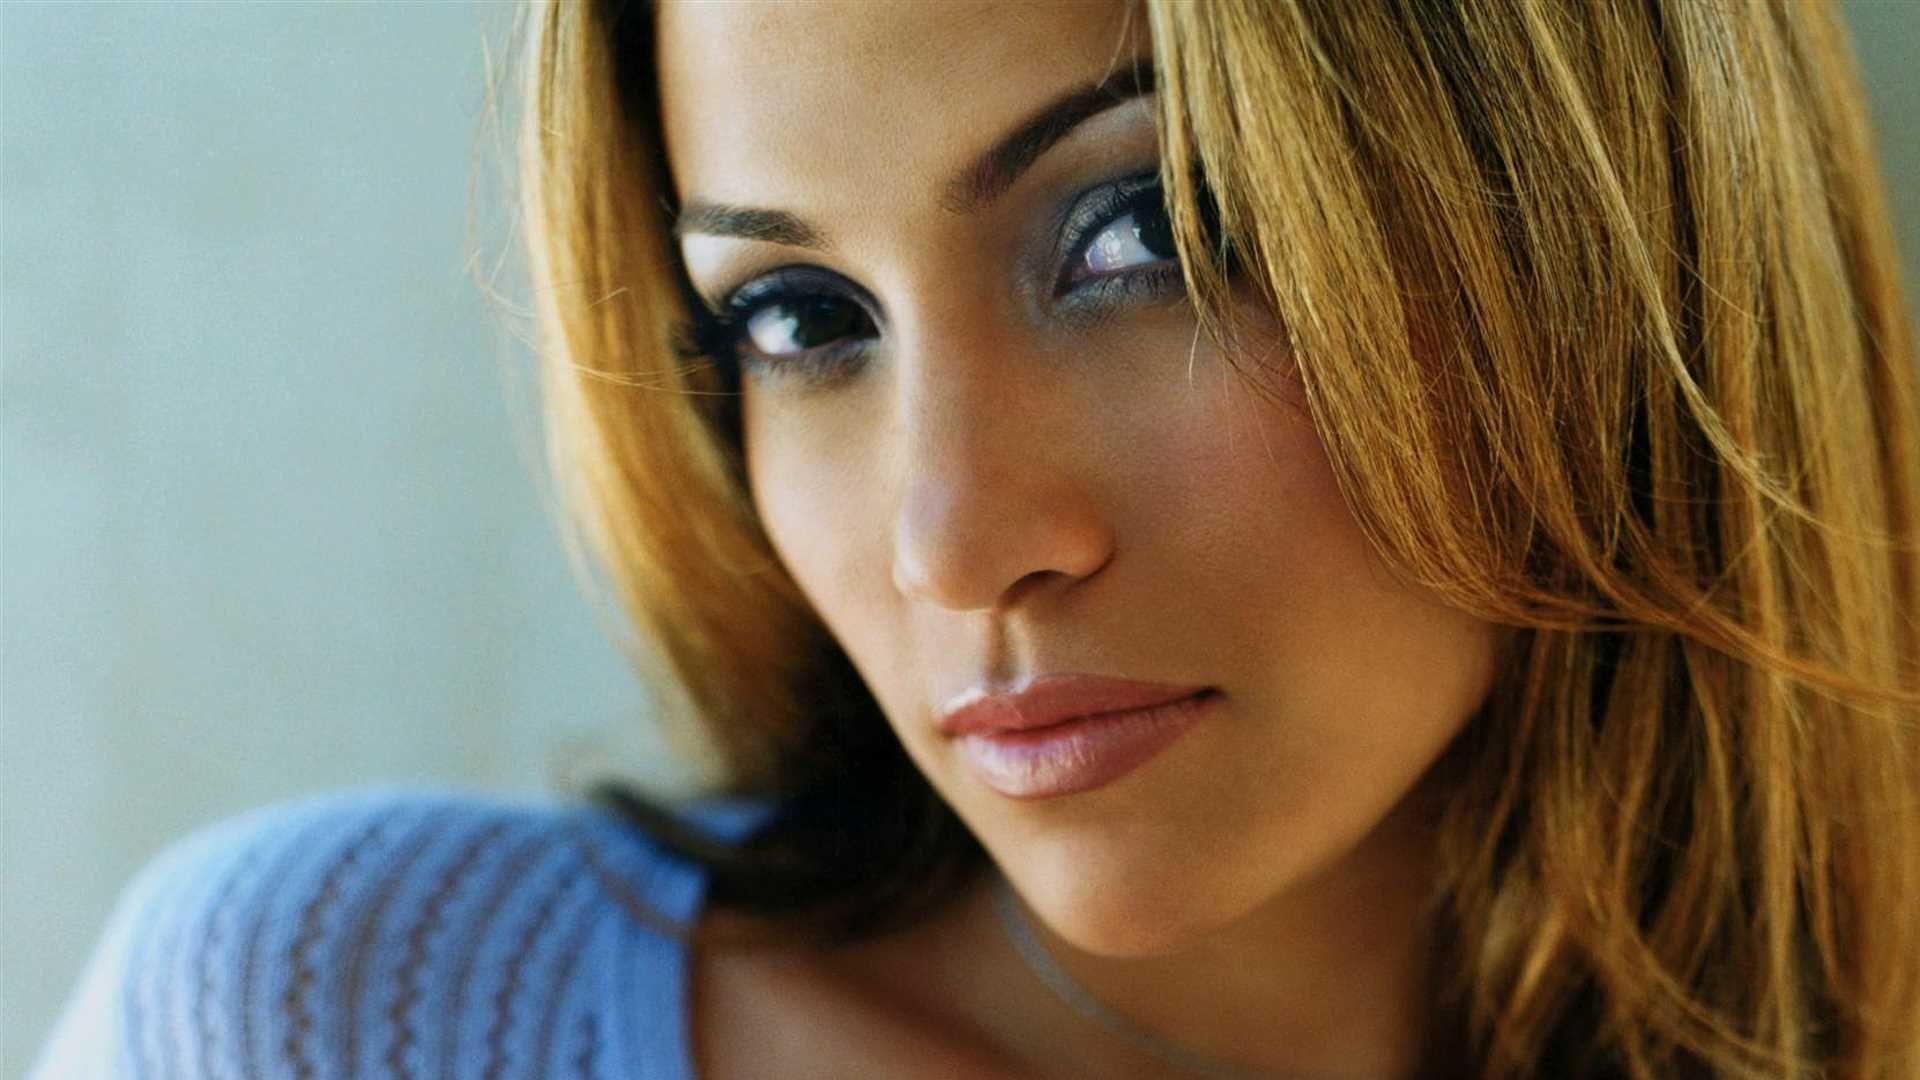 Jennifer Lopez Wallpapers 2015 1920x1080